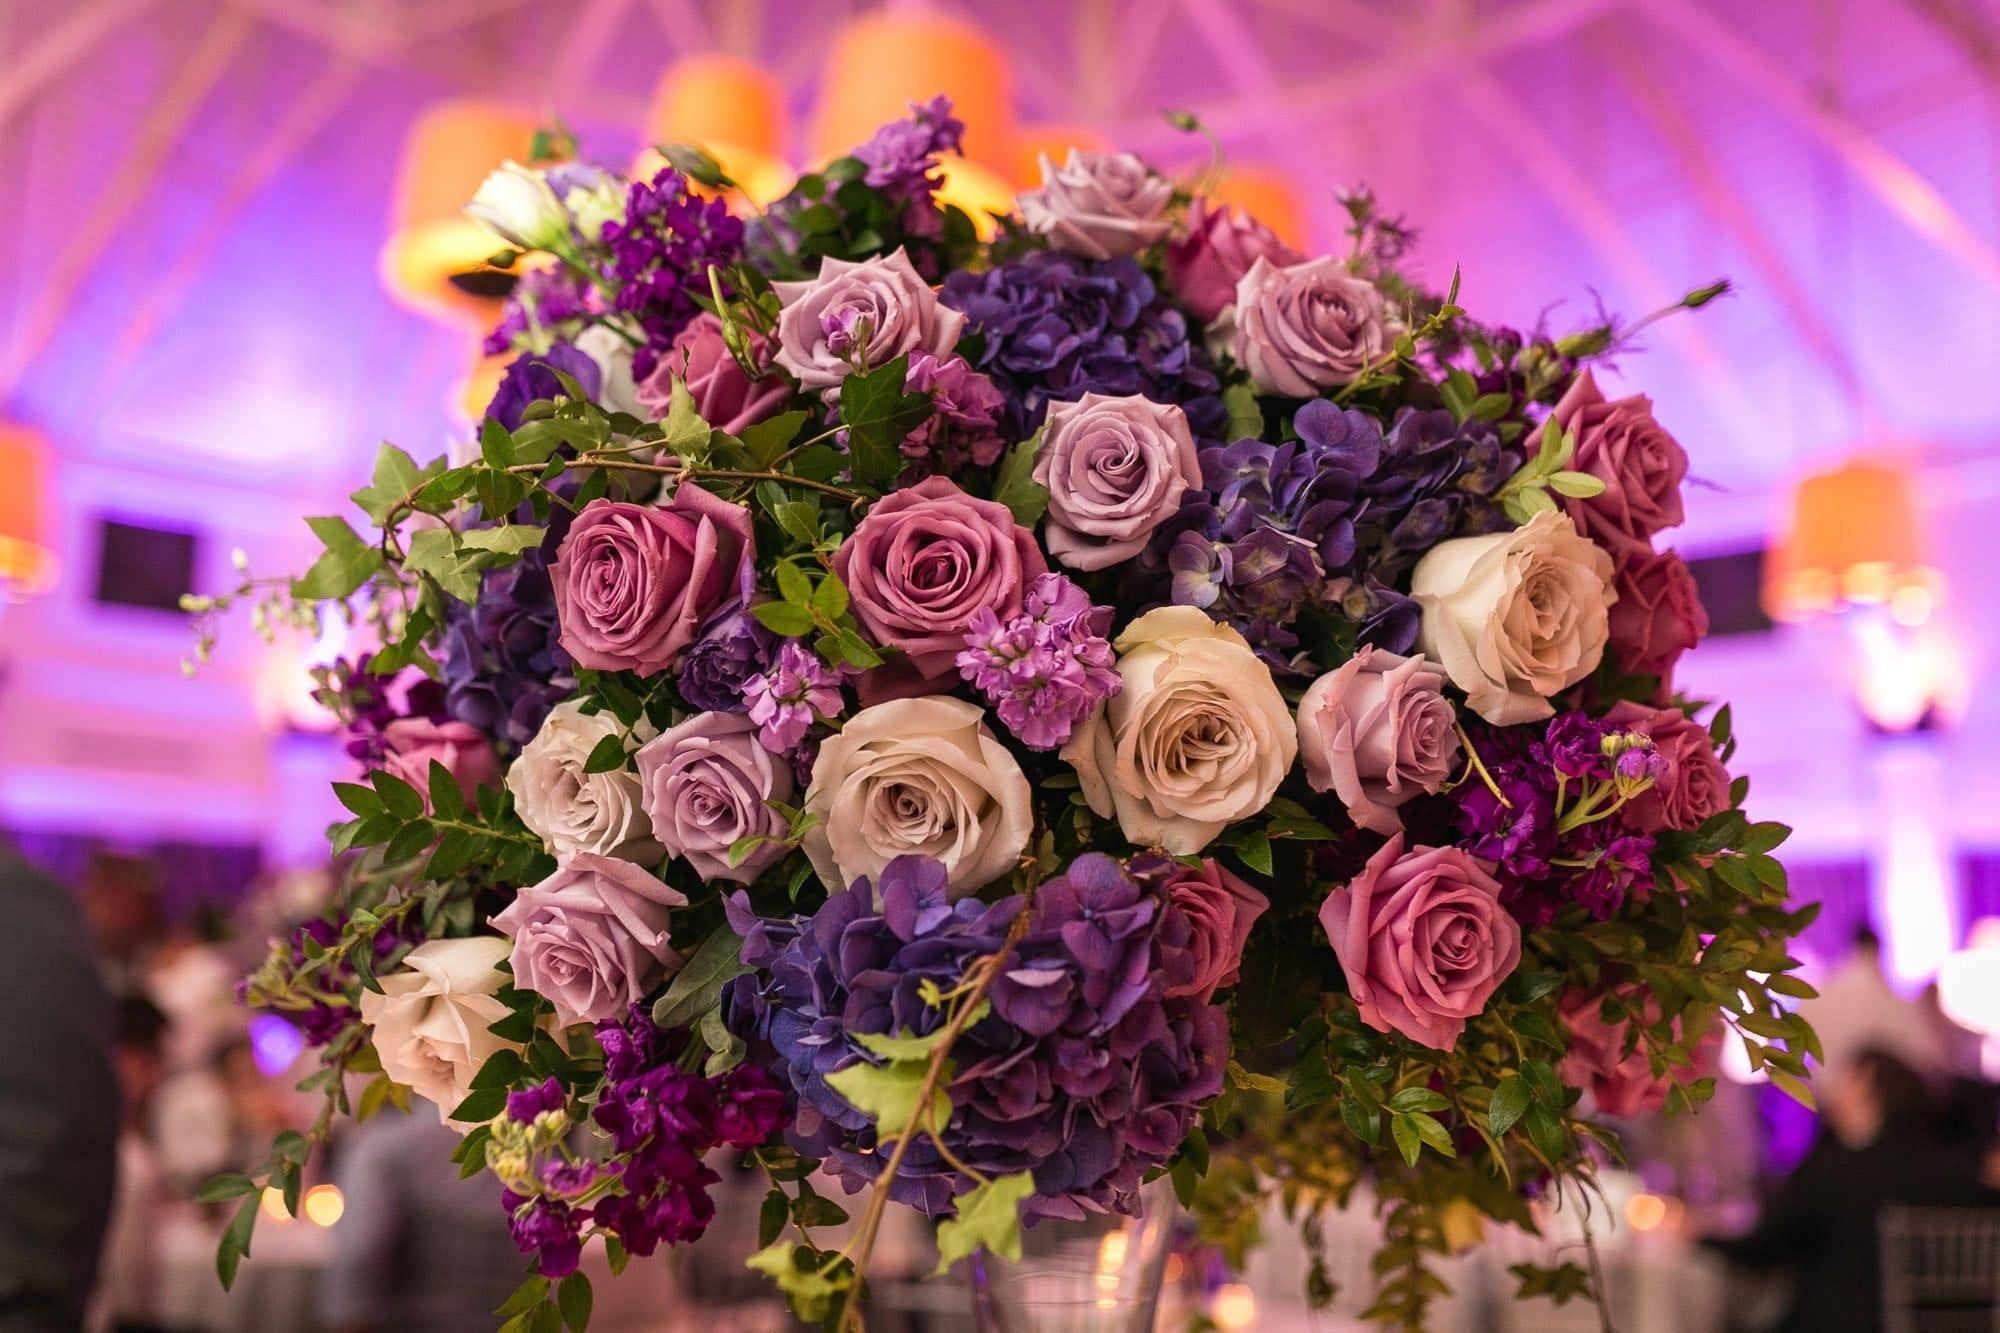 BOLD COLORED ROSES FLOWER ARRANGEMENT